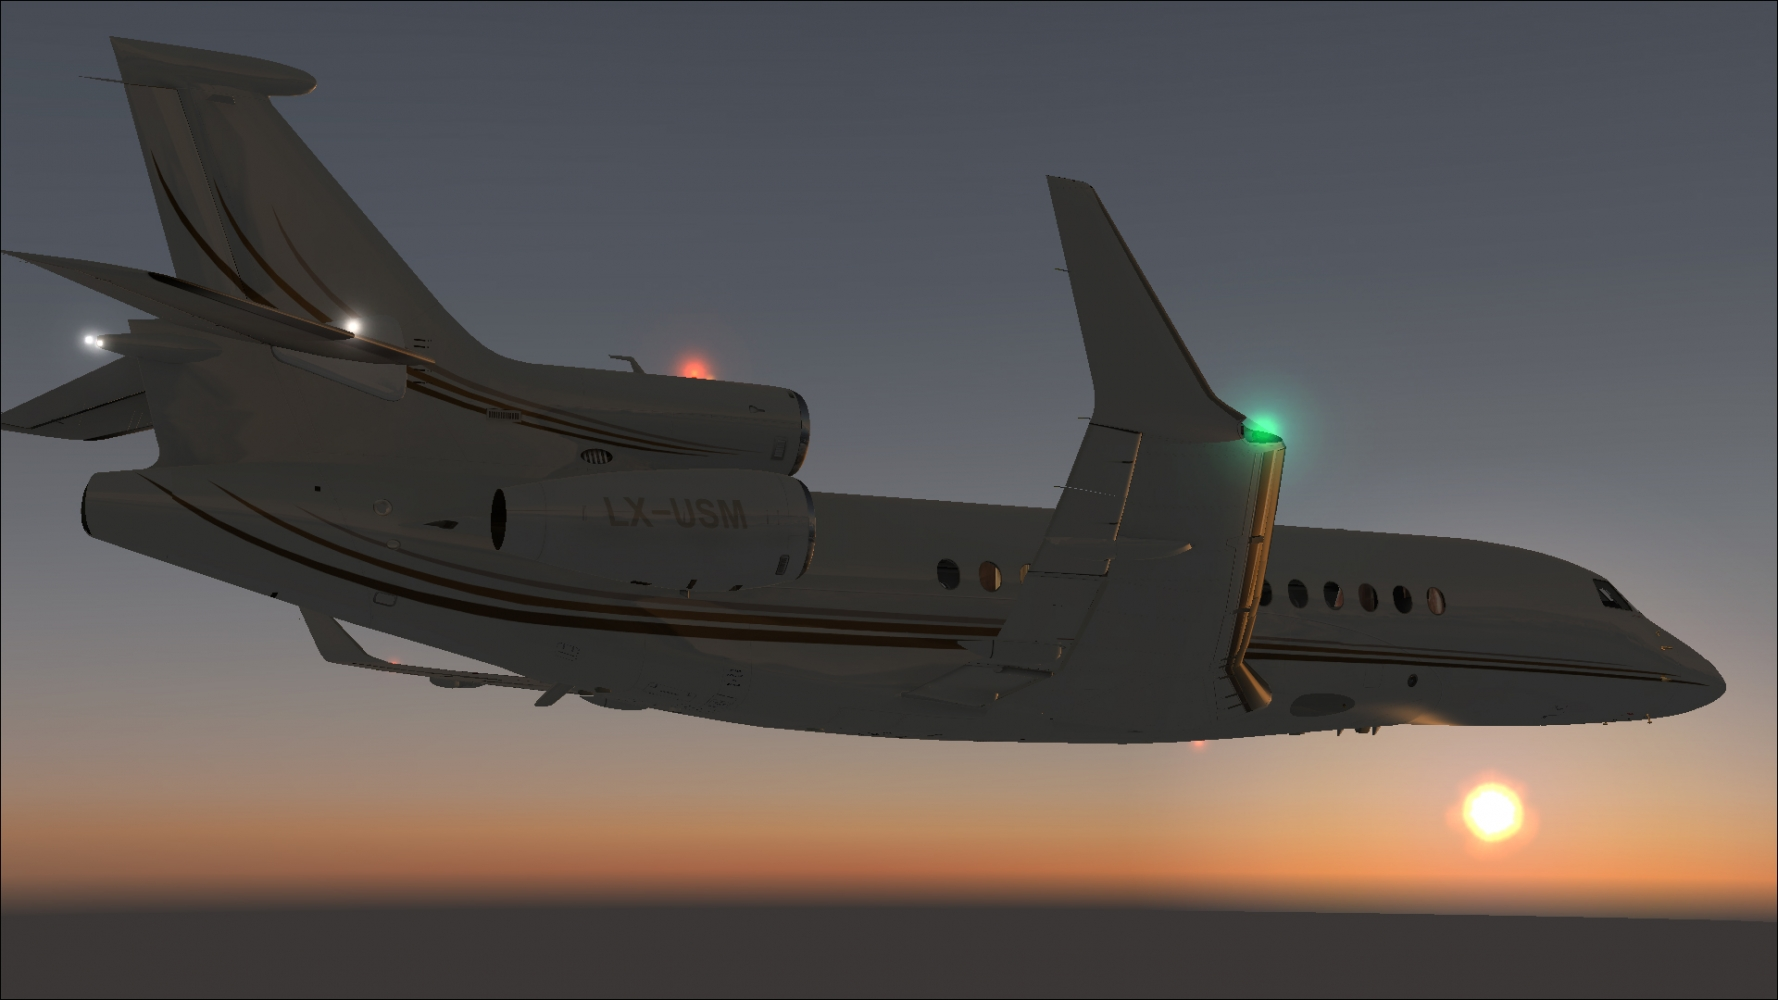 P7xL5MJ.jpg